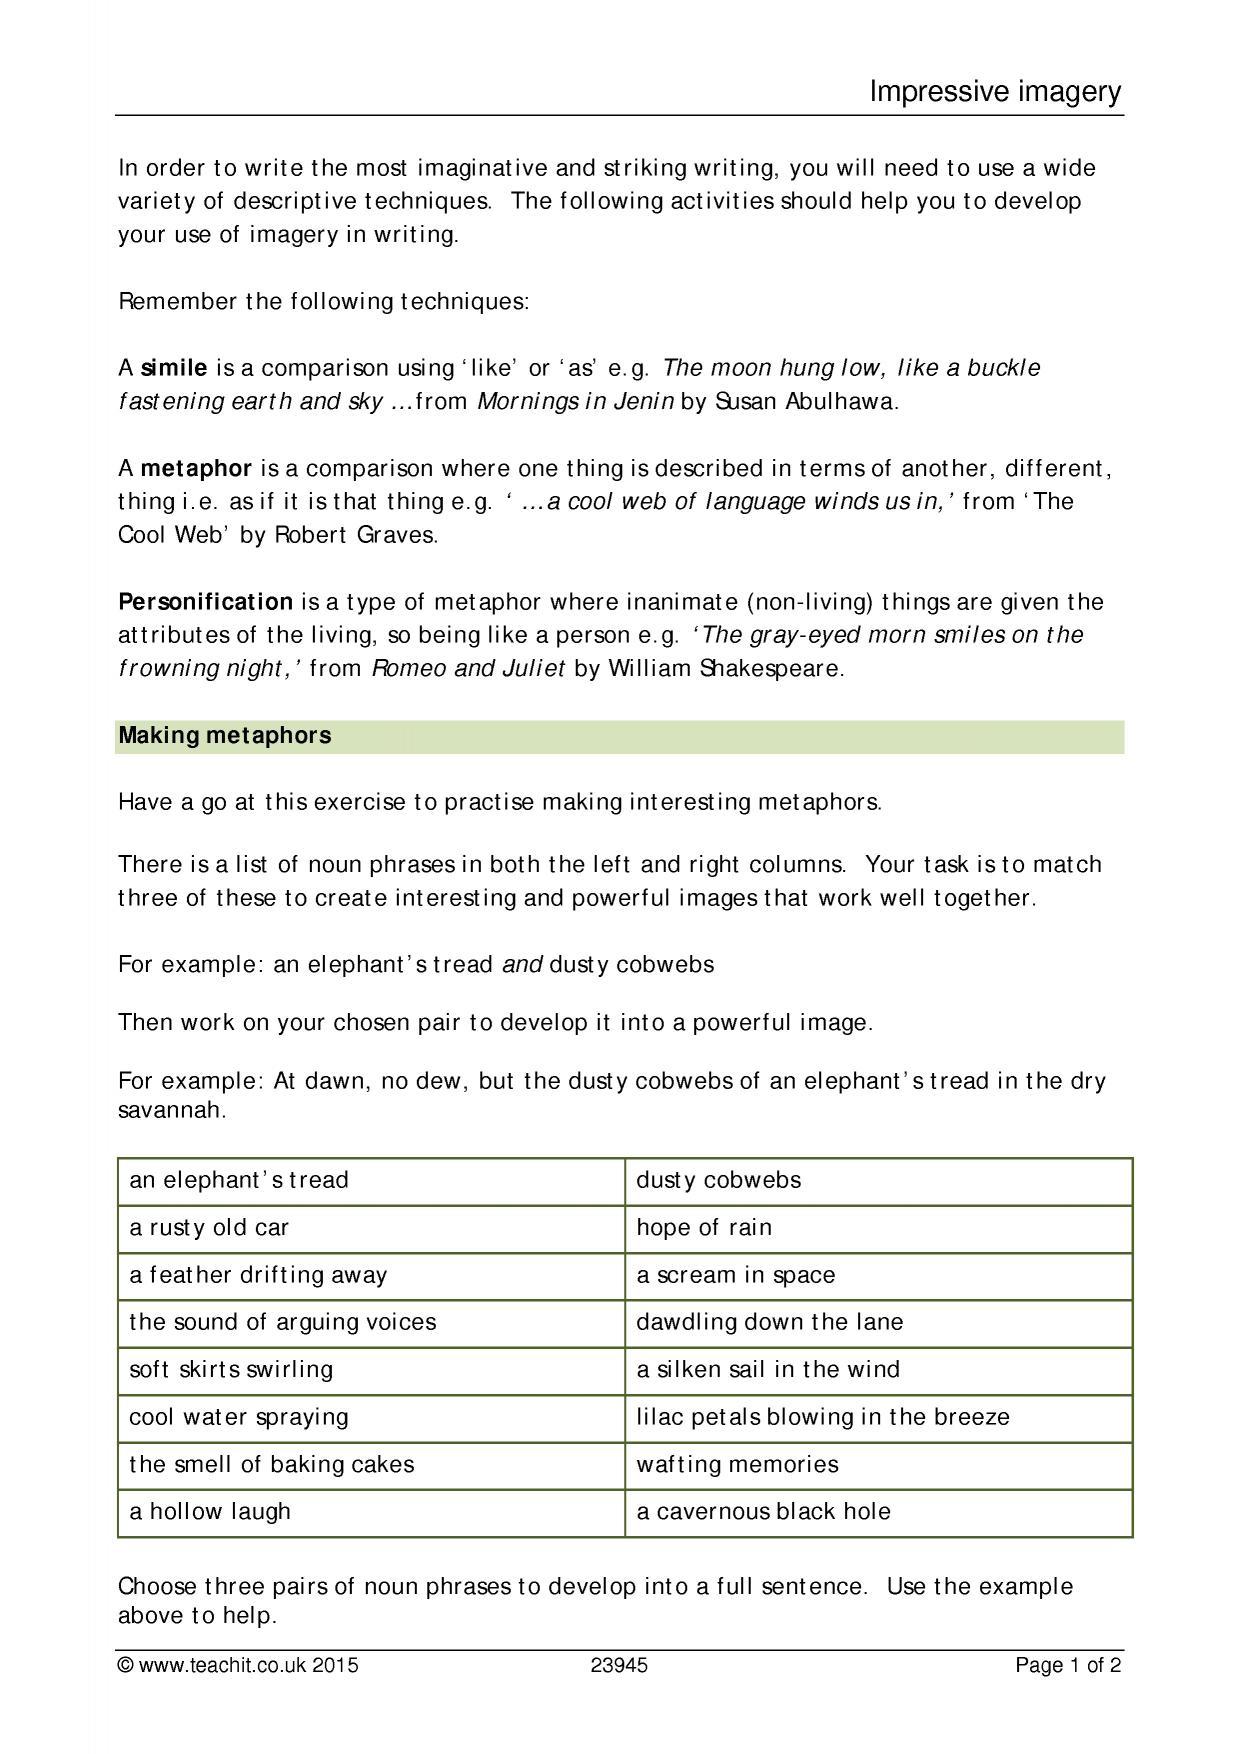 Example Essay Argumentative Writing  Preview Ks  Writing Academic Argument Essay Example also Gun Control Essay Conclusion Ks  Descriptive Writing  Teachit English Sample Of Reflective Essay In Nursing